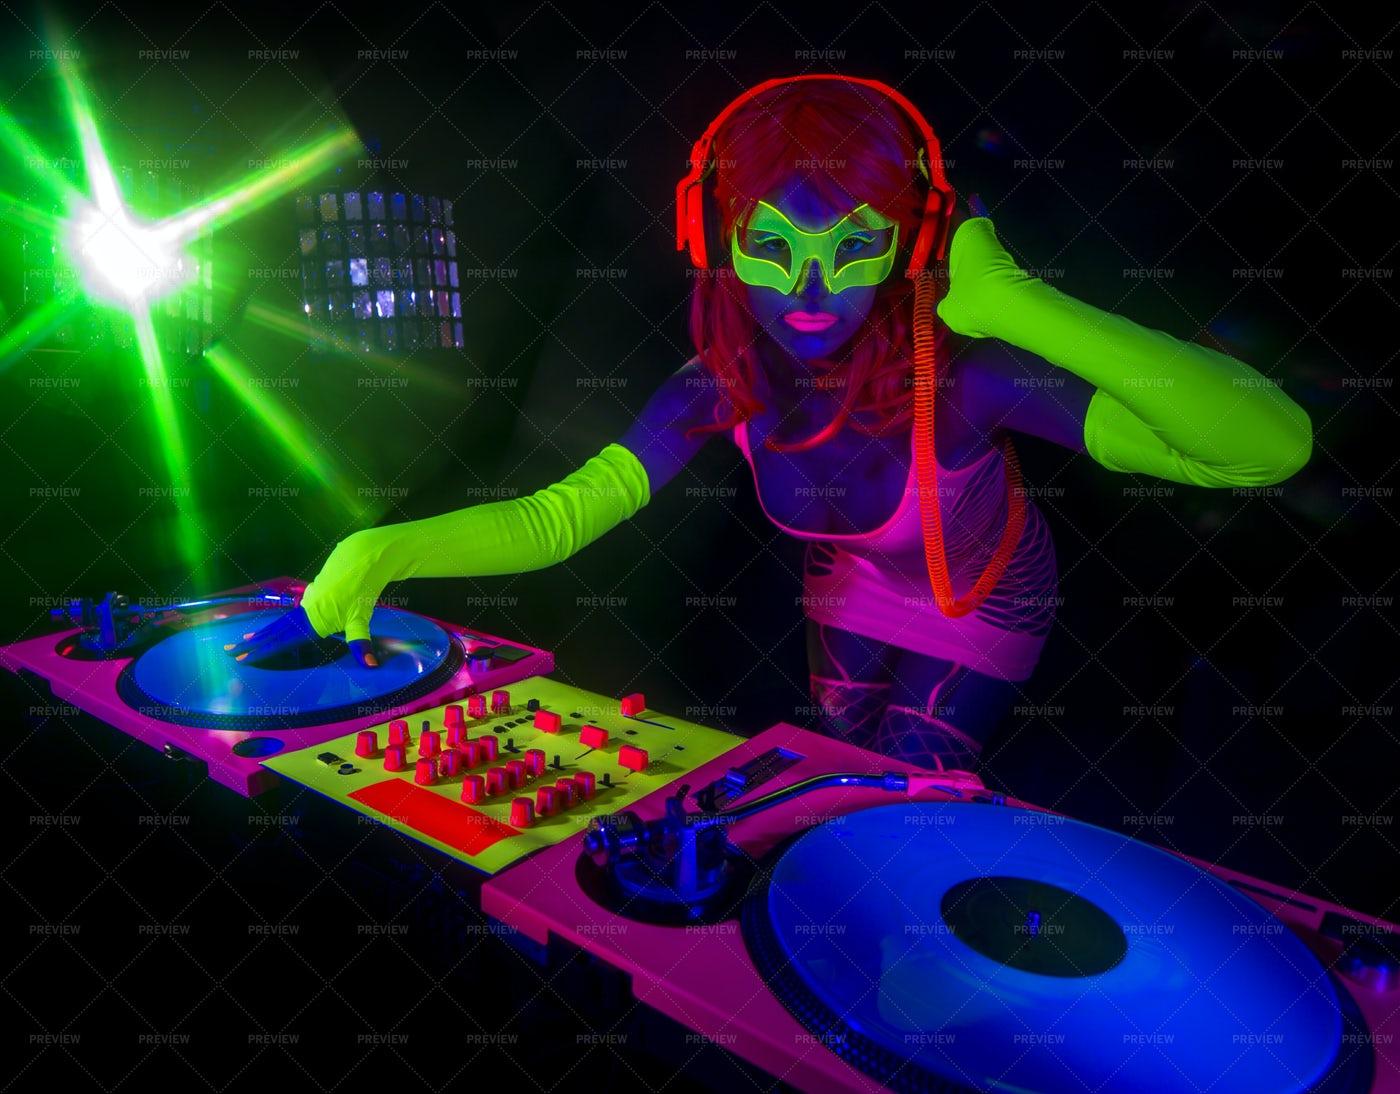 DJ In Neon Clothing: Stock Photos